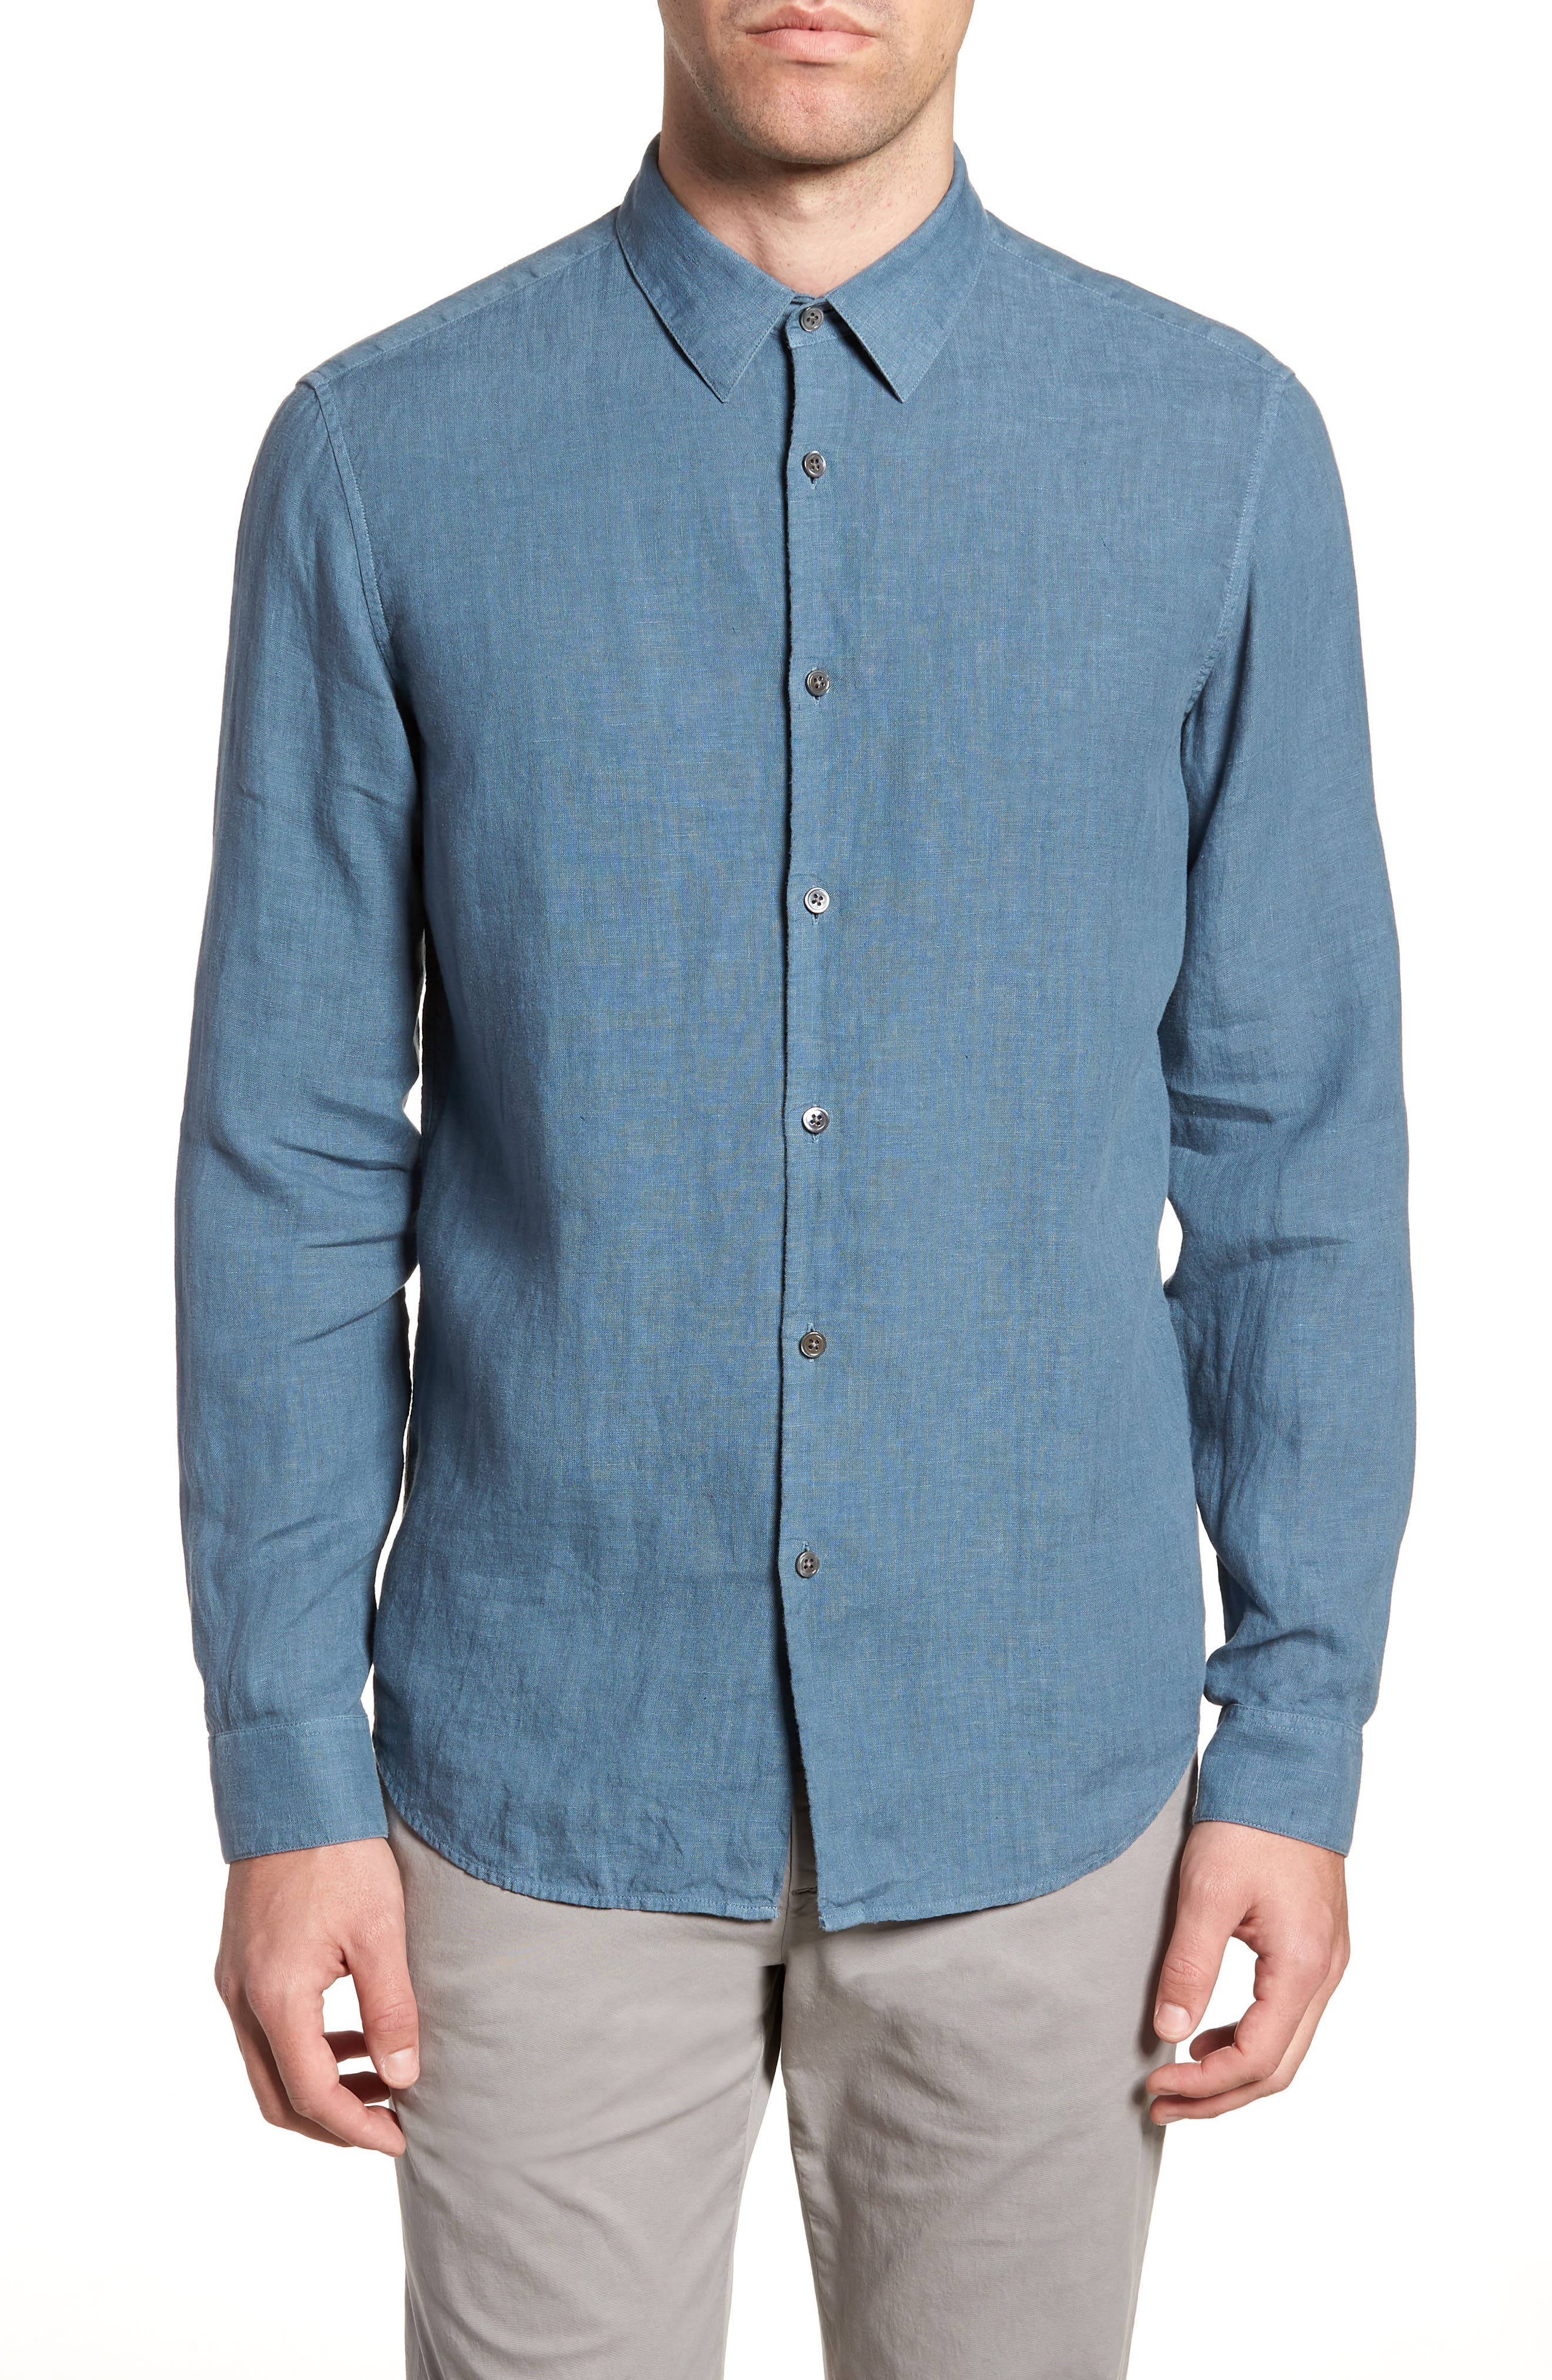 Irving Trim Fit Solid Linen Sport Shirt,                             Main thumbnail 1, color,                             Hydro